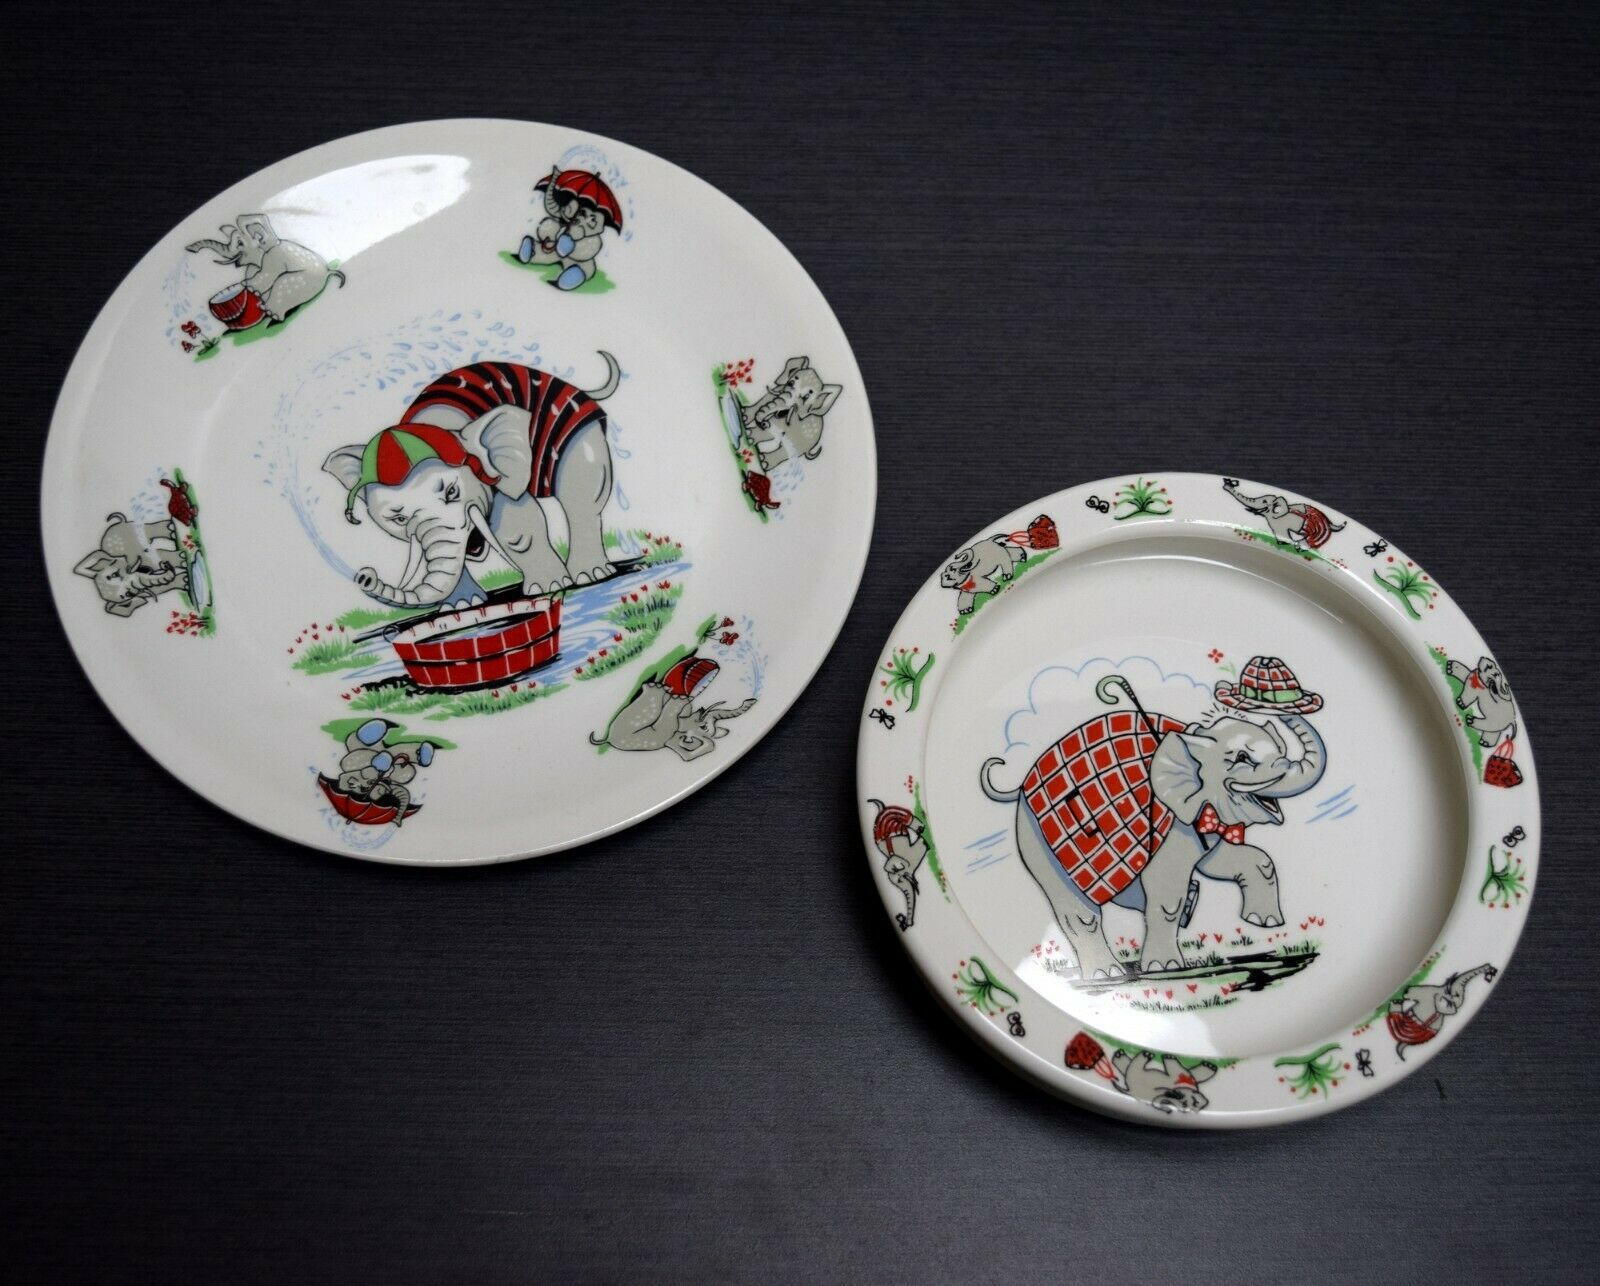 Figgjo Flint Norway Childrens Bowl Plate Set Elephant Juvenile Nursery Dishes Ebay Circus Plates And Bowls Plates Plate Sets